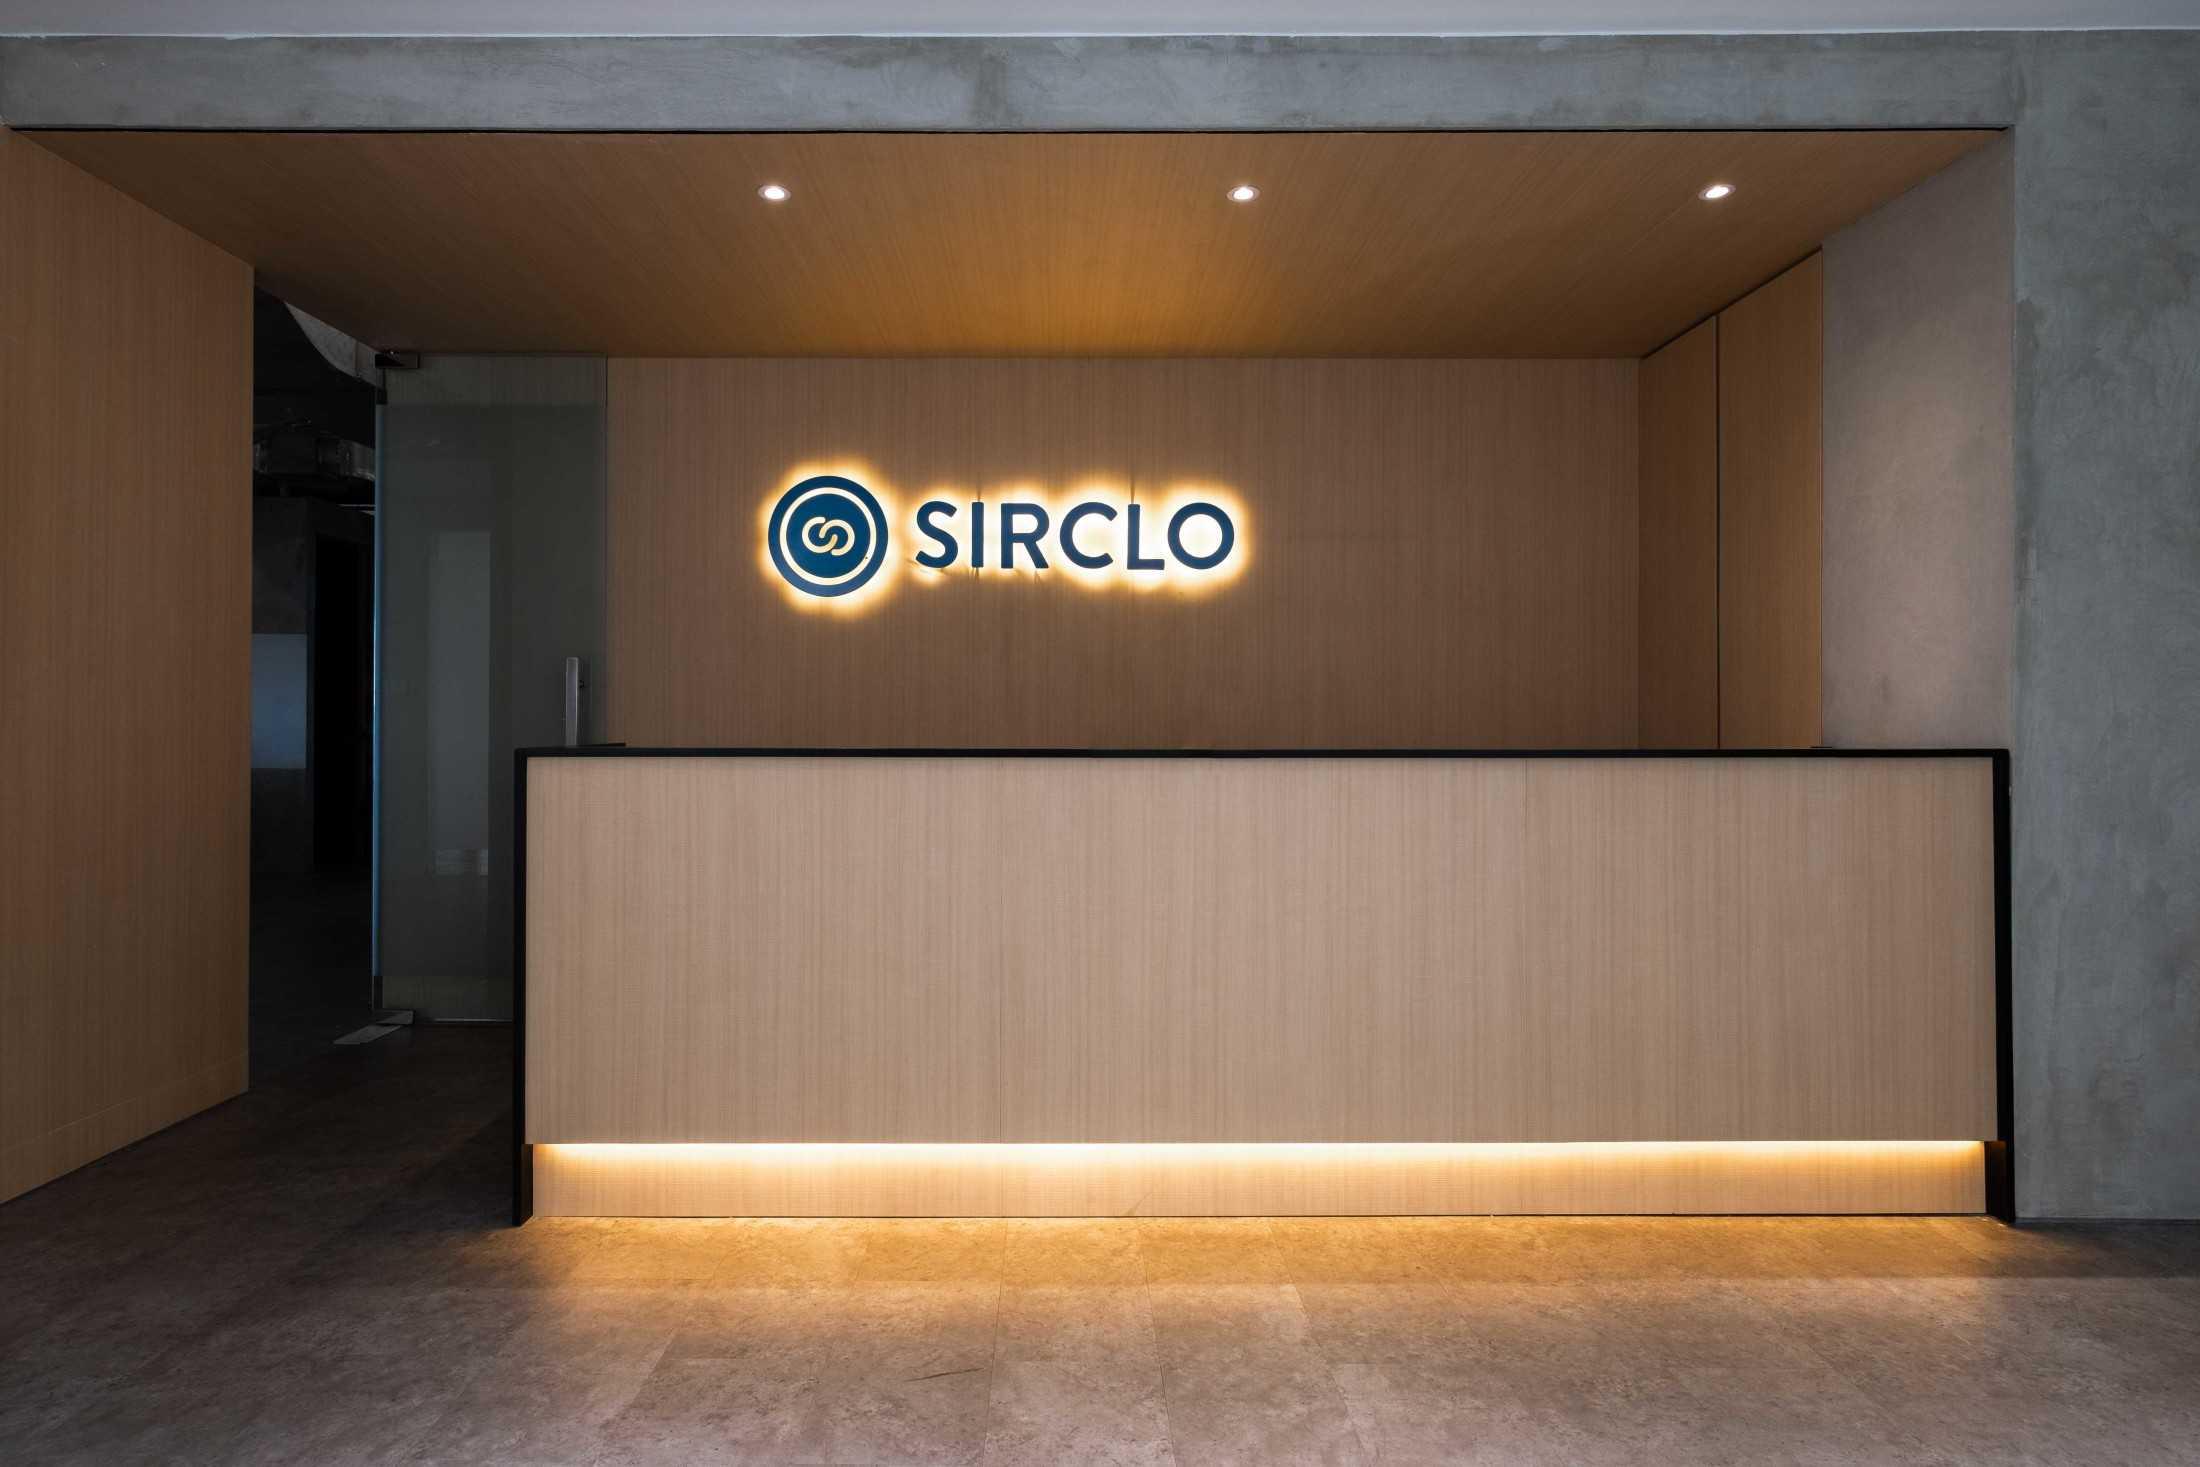 Desain Kantor Minimalis Industrial Sirclo Office yang Super Cozy untuk Kaum Milenial | Foto artikel Arsitag